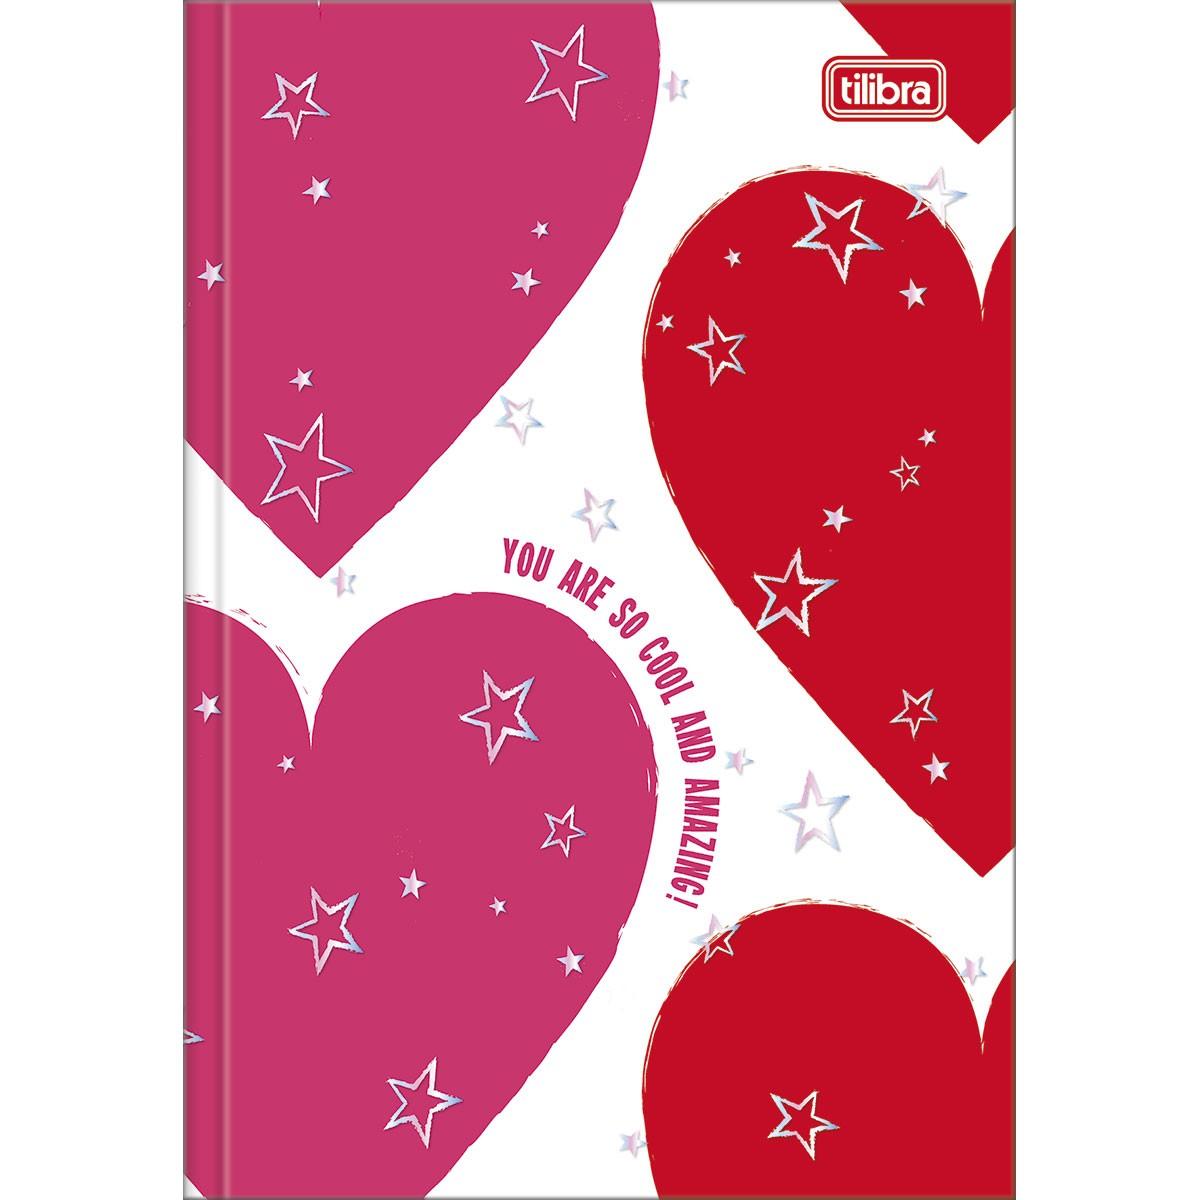 CADERNO CAPA DURA BROCHURA 1/4 LOVE PINK 80 FOLHAS - CAPAS SORTIDAS